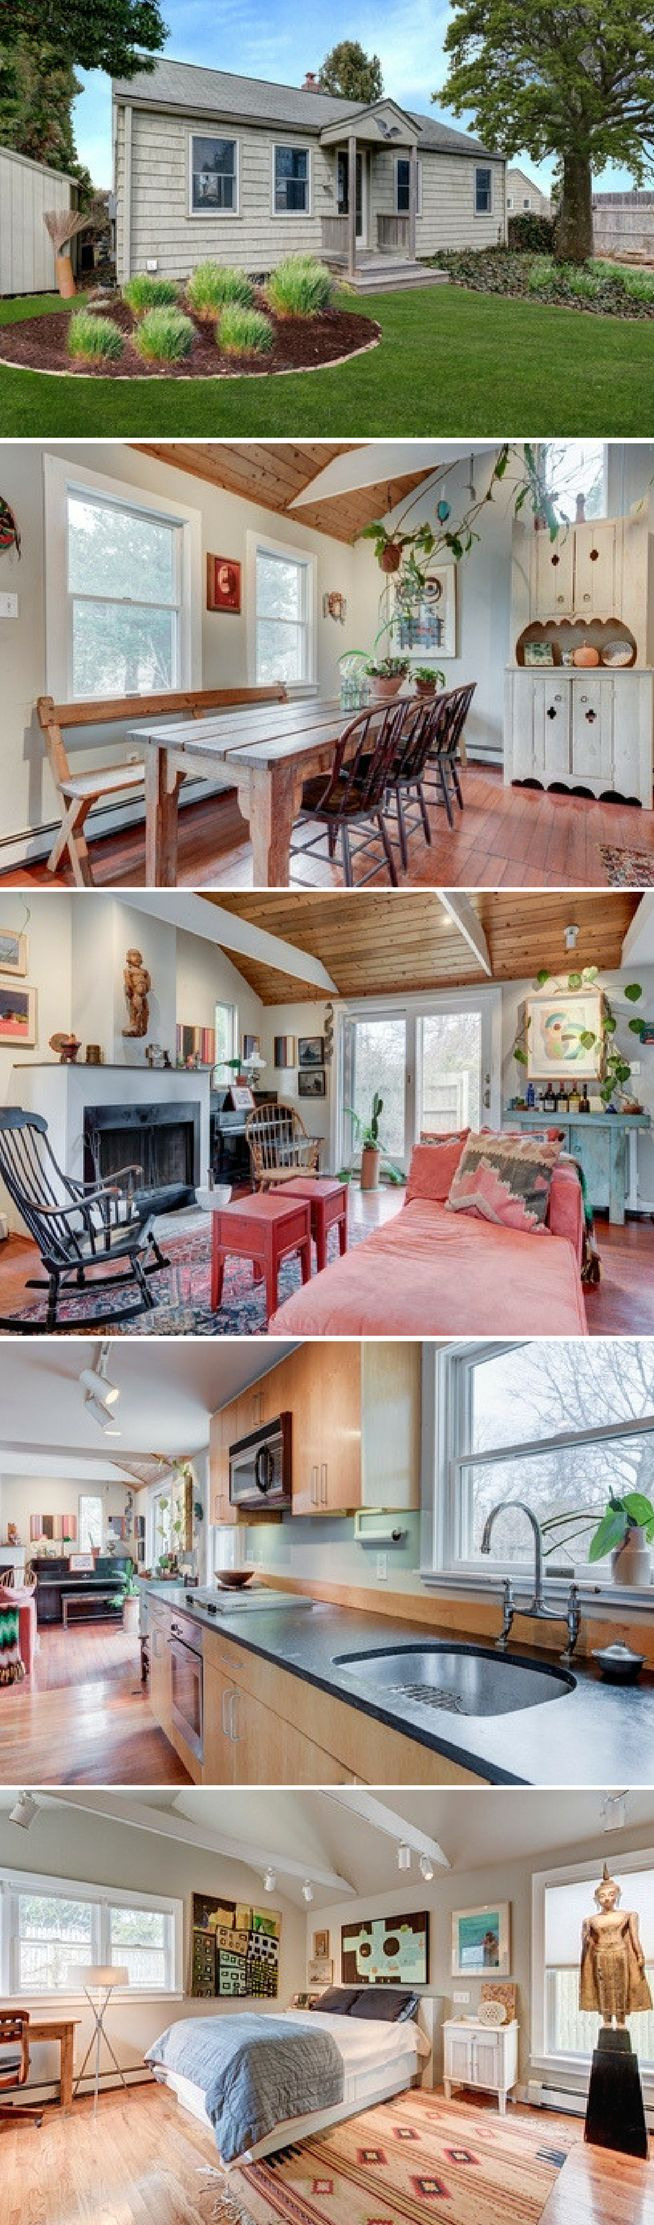 An East Hampton cottage (1,000 sq ft)